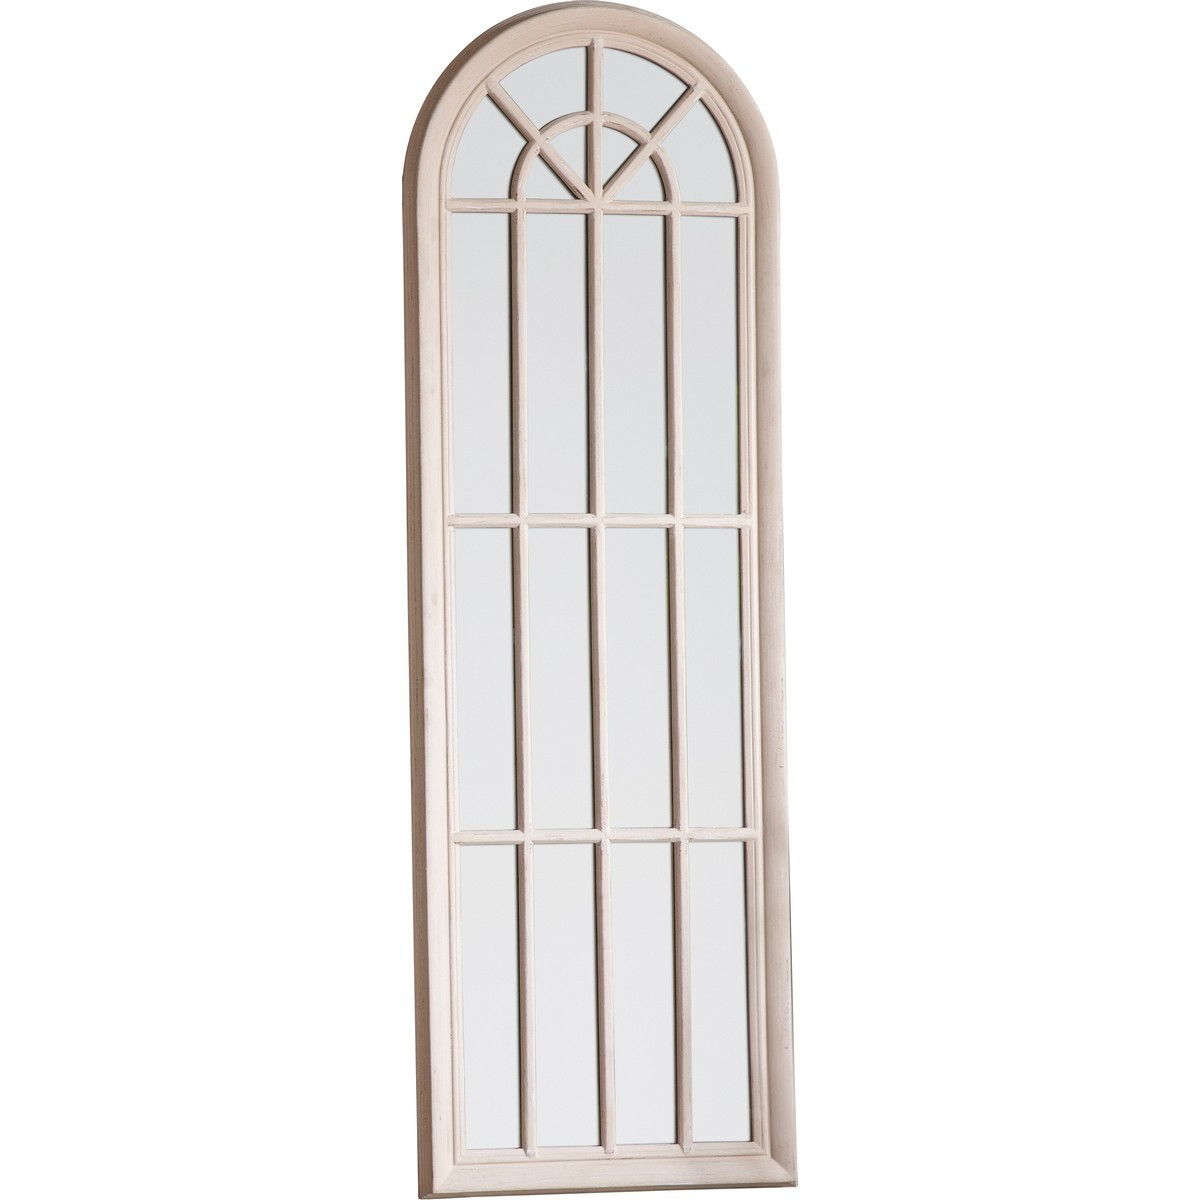 Calam Arch Panelled Window Floor Mirror, 180cm, Antique White